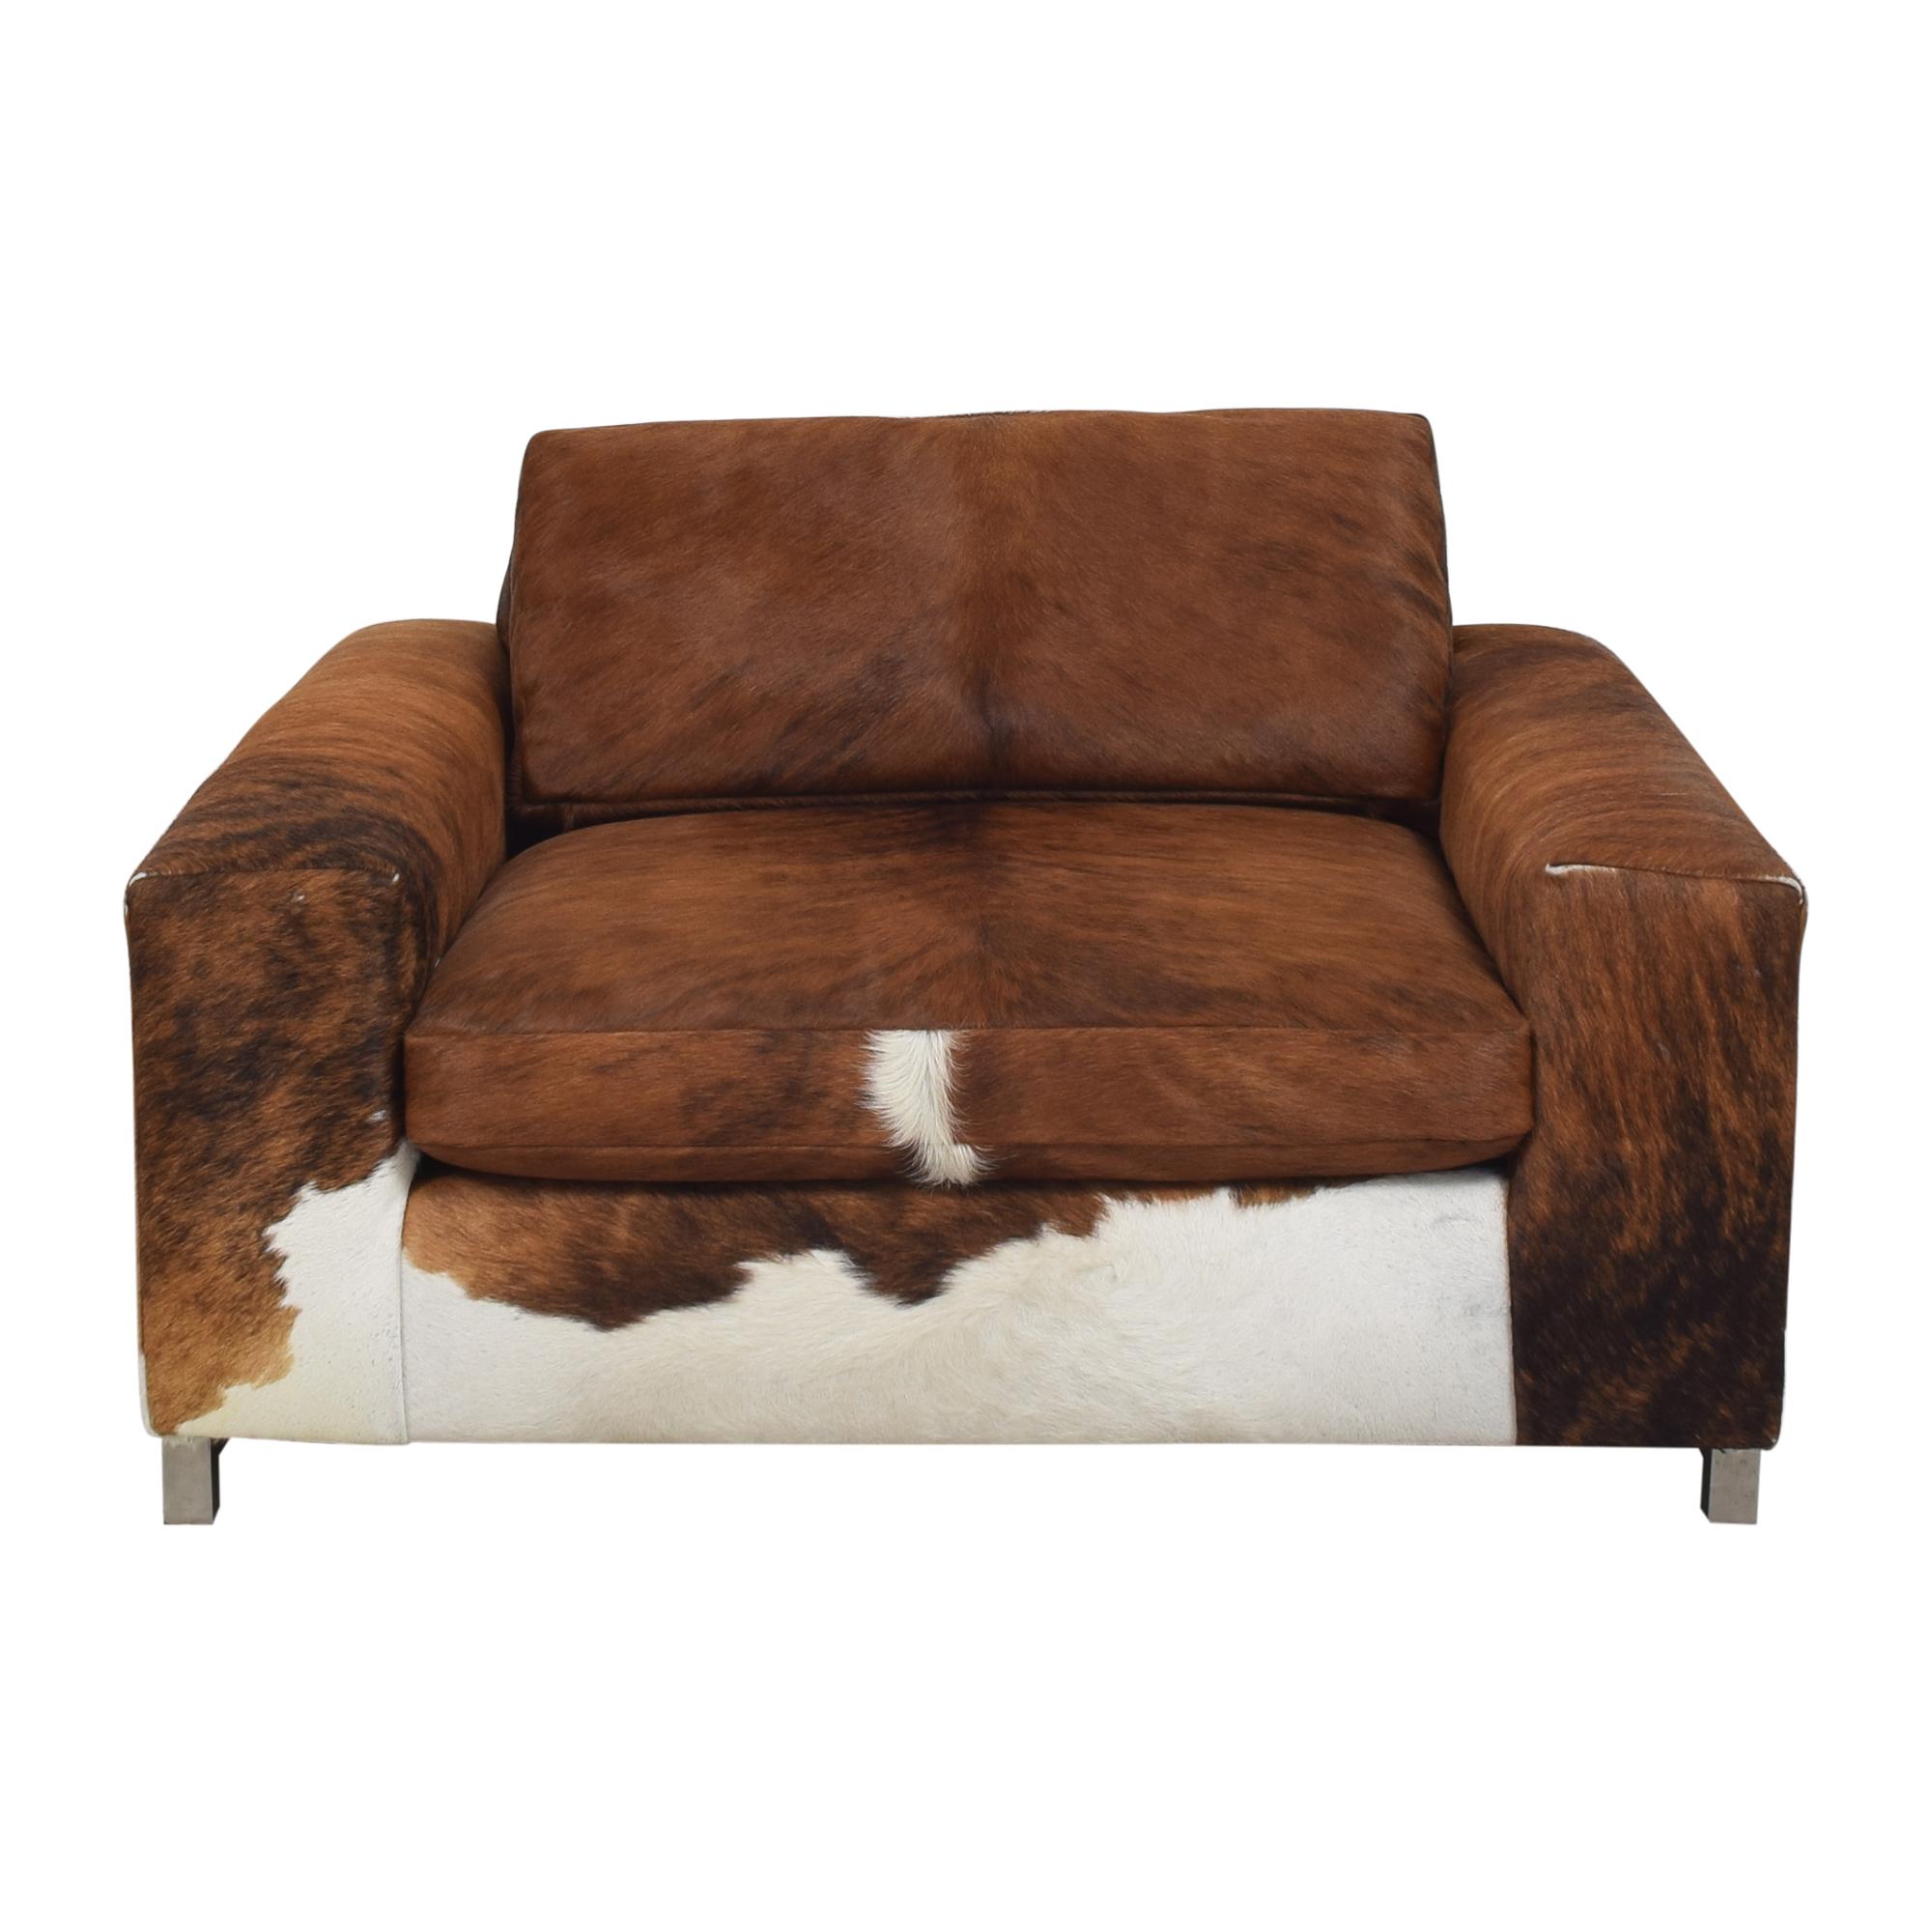 Room & Board Custom Room & Board Hide Lounge Chair second hand